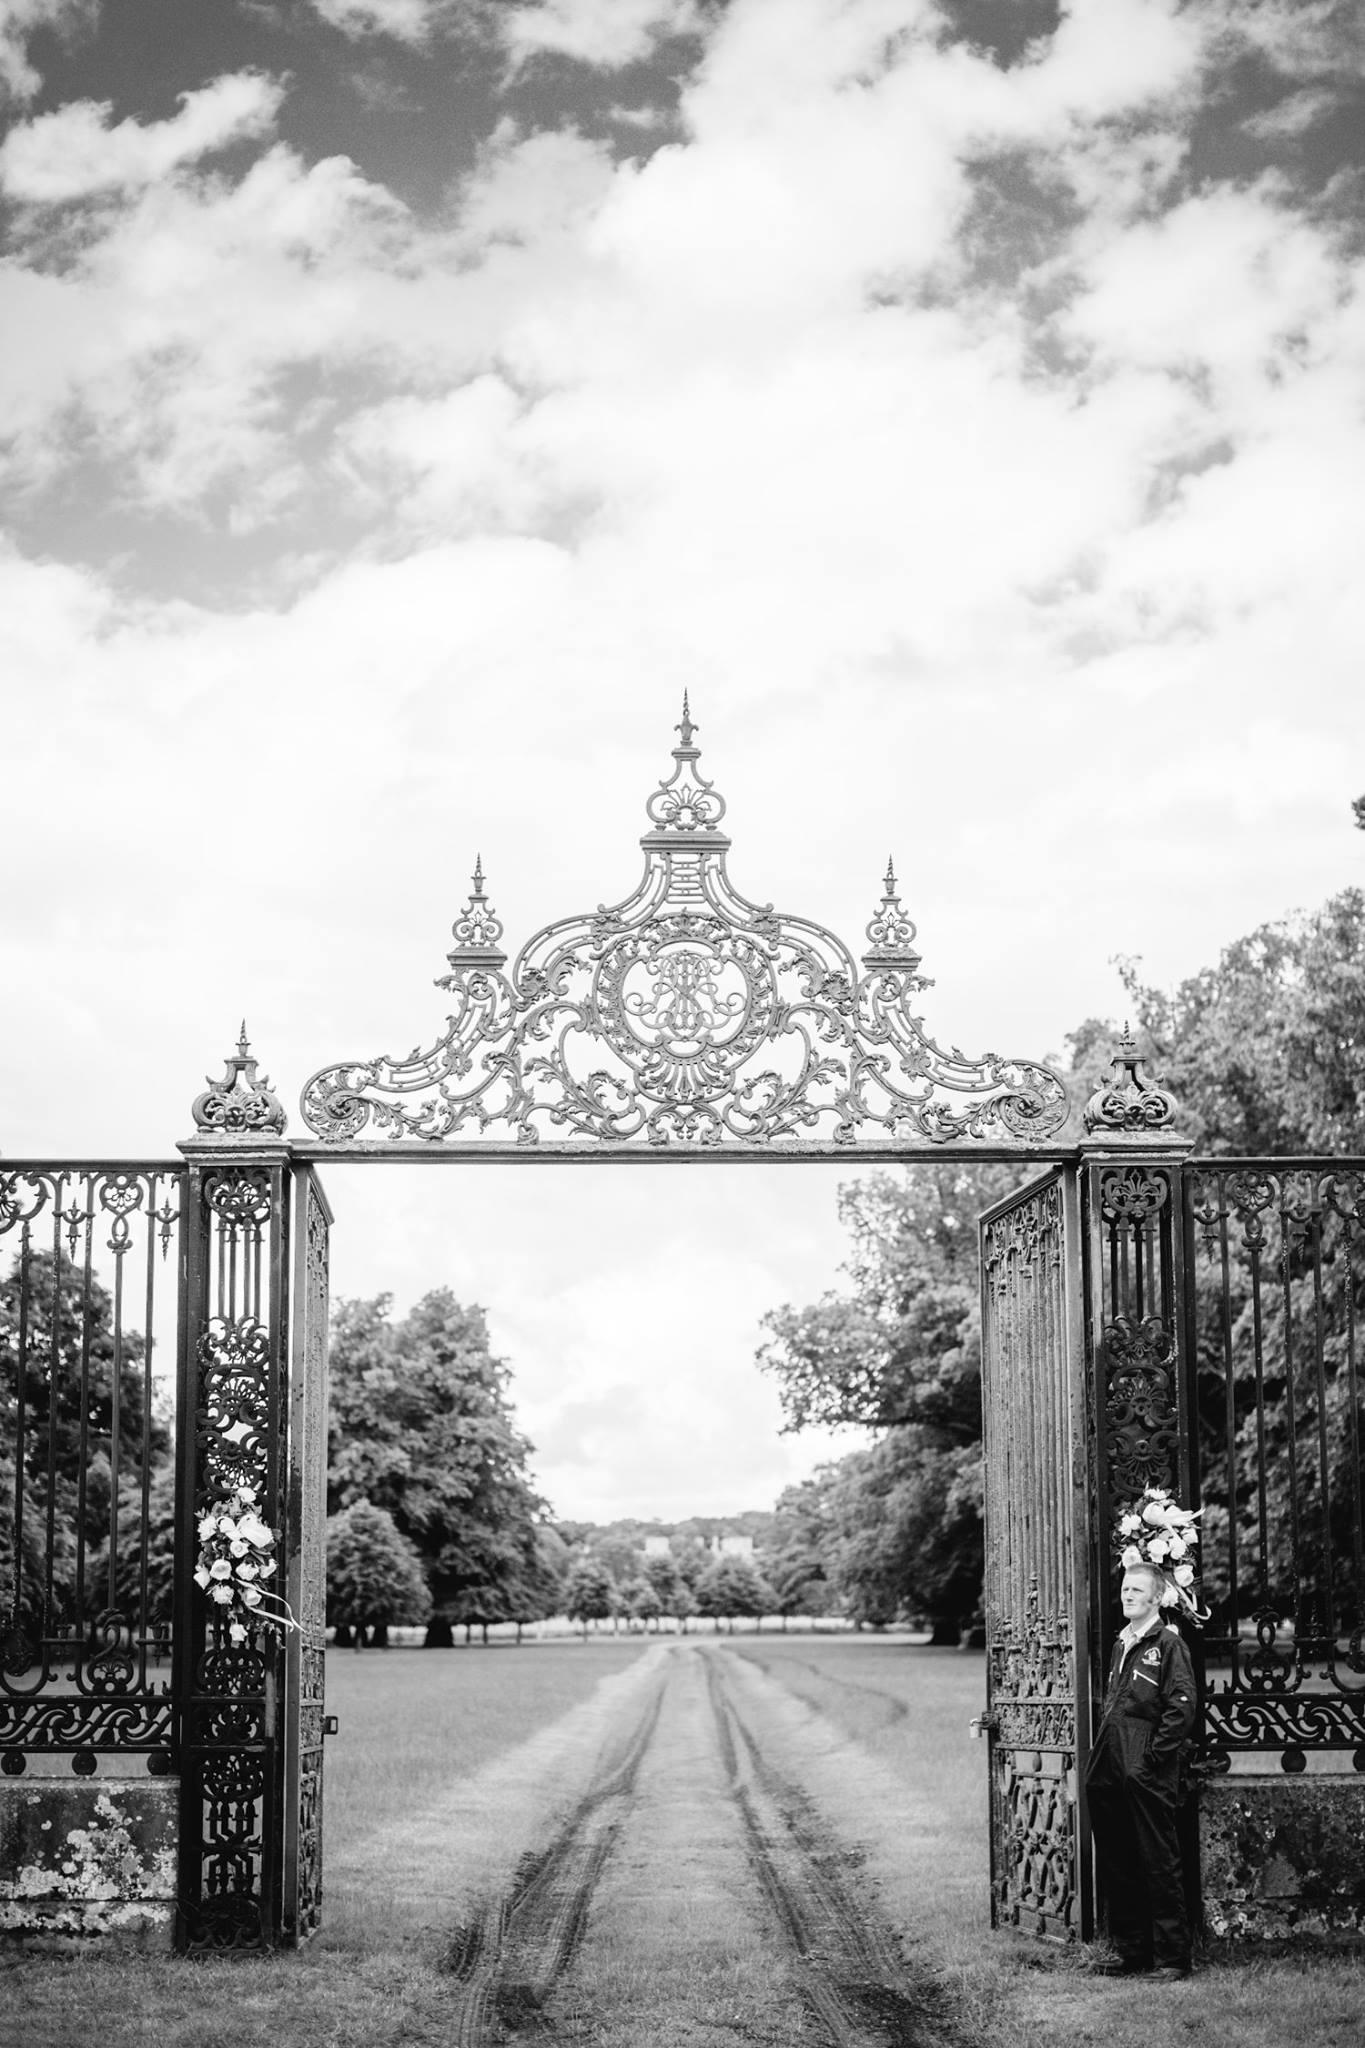 revesby gates.jpg